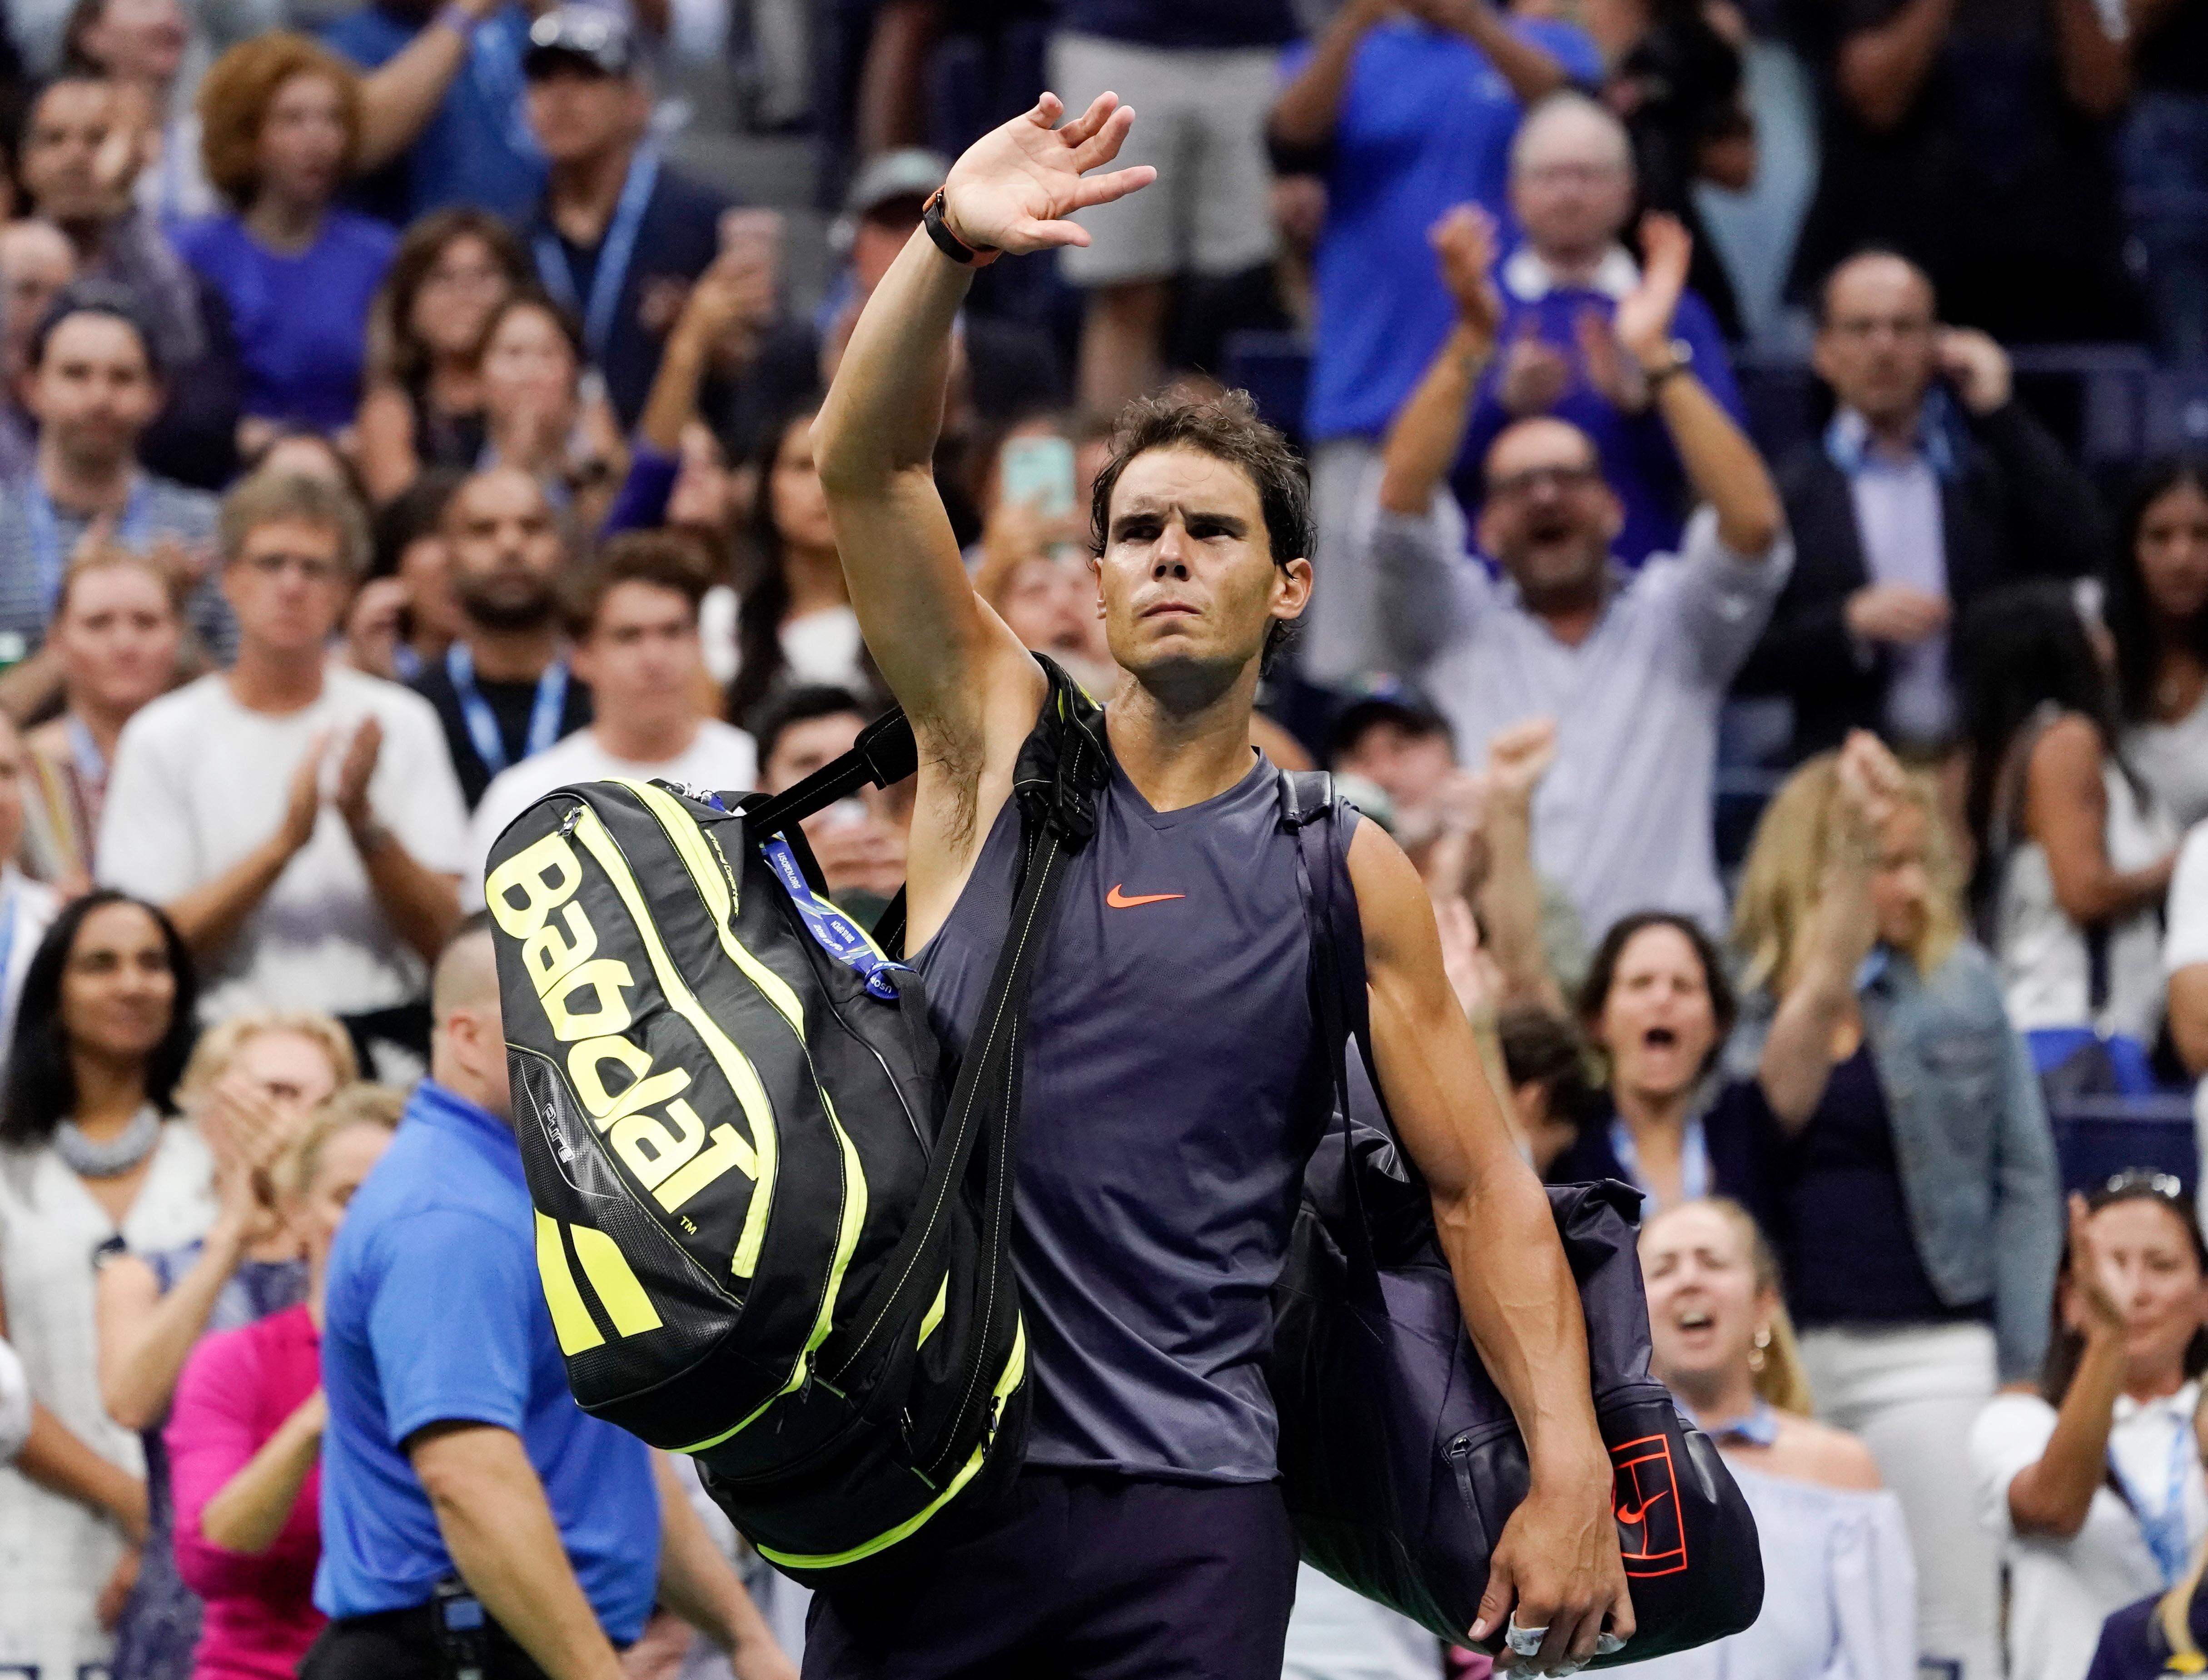 Nadal sẽ trở lại tại Paris Masters Ảnh 1